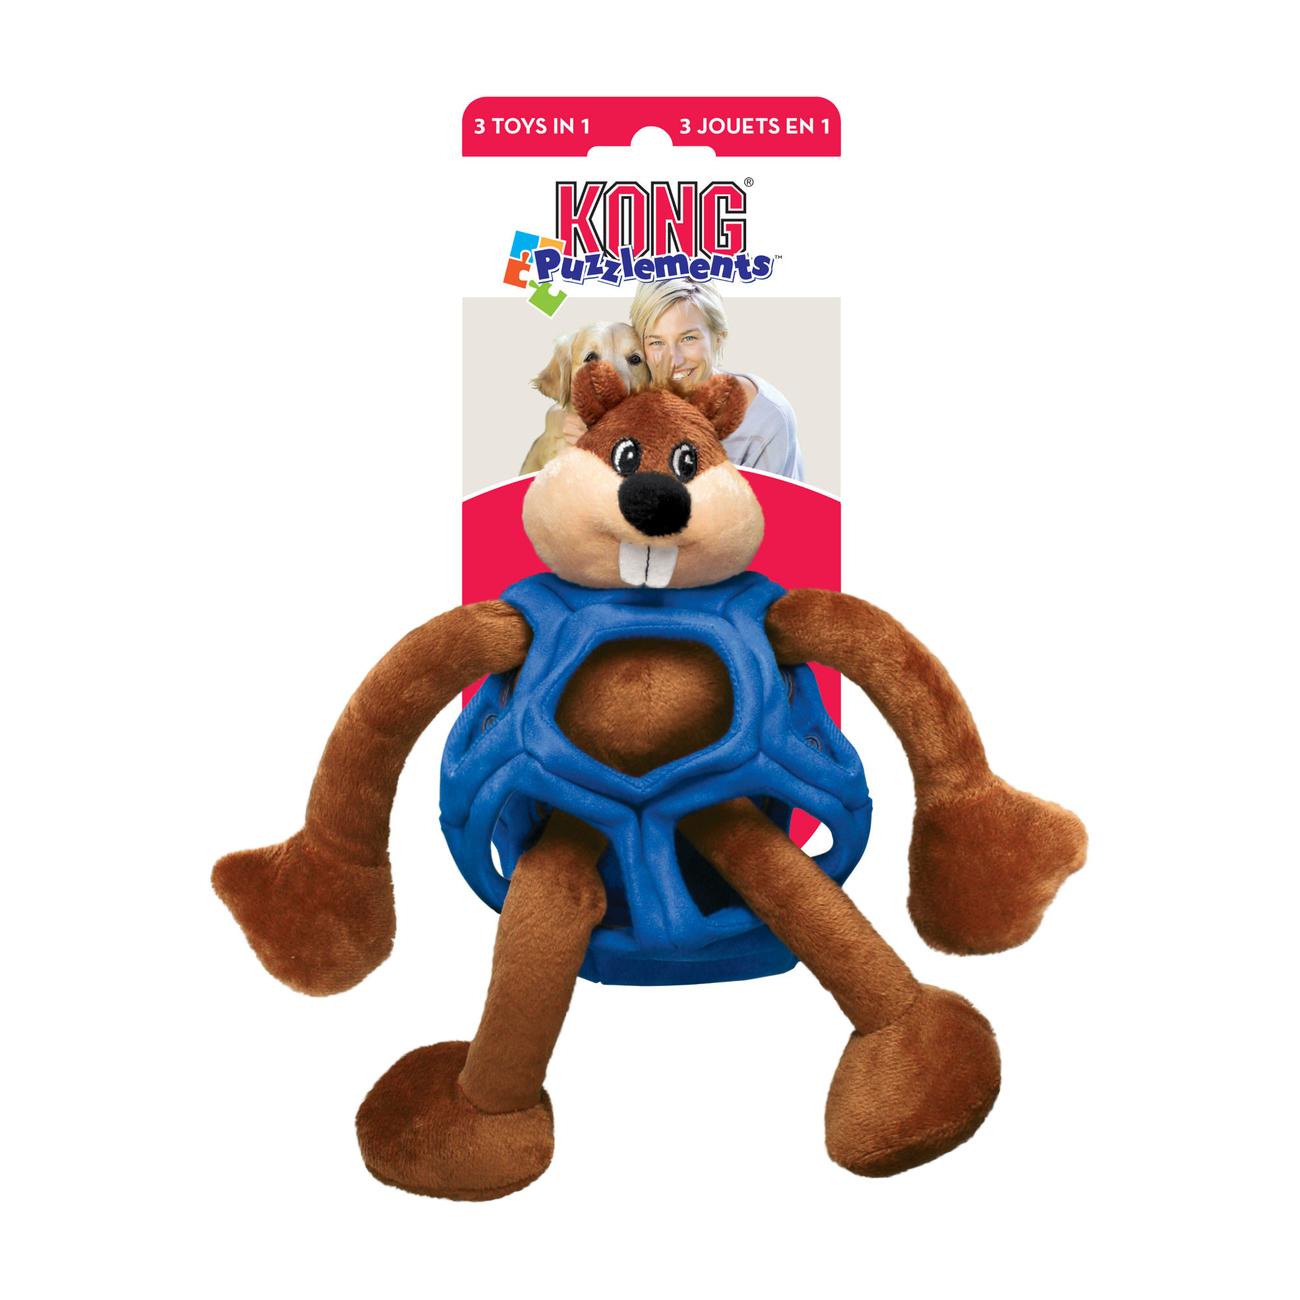 KONG Puzzlements Hundespielzeug, Bild 4